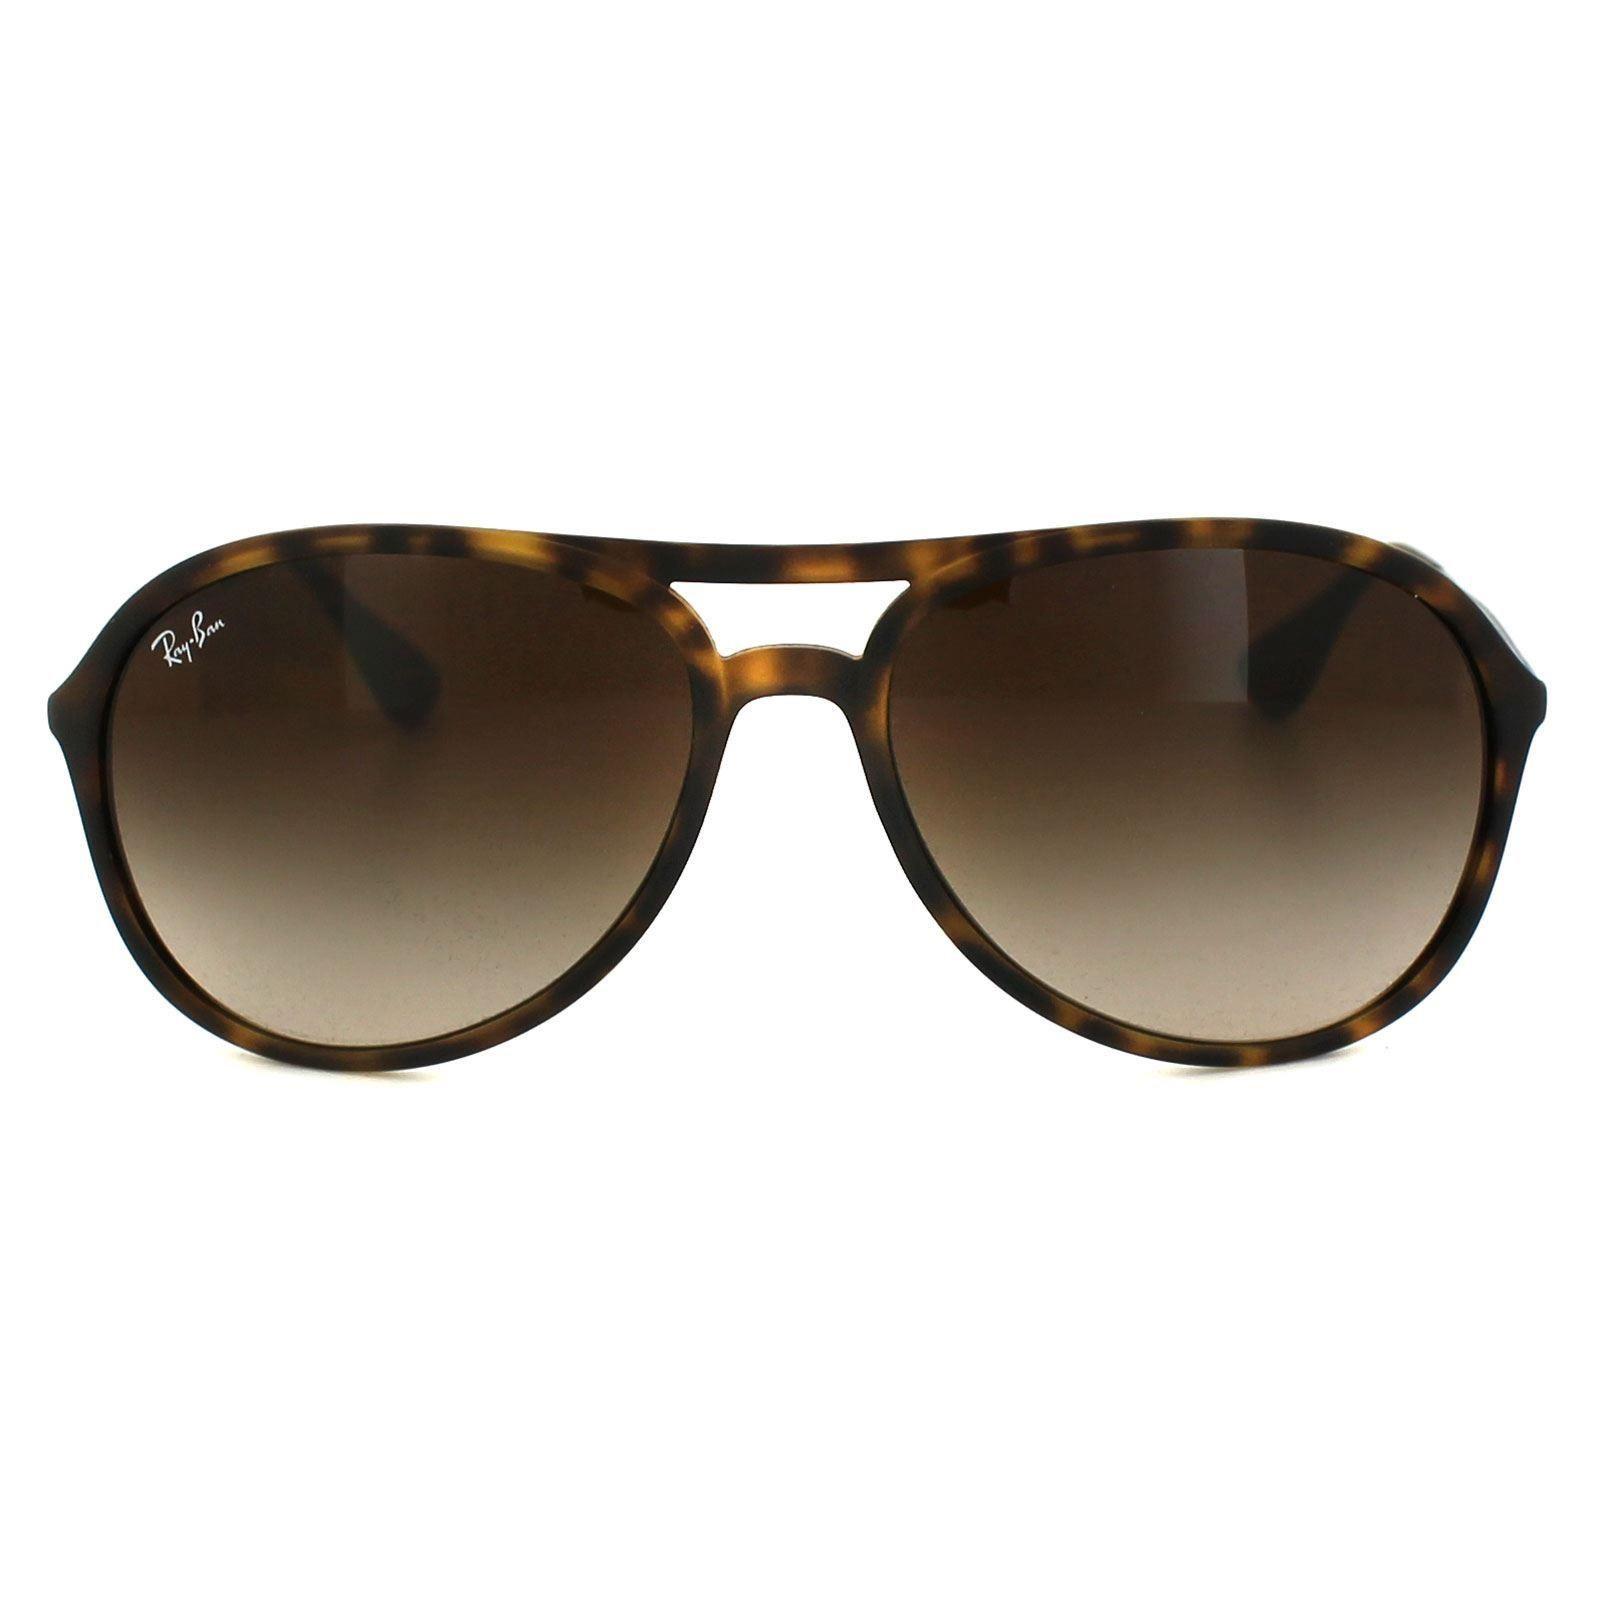 Ray-Ban Sunglasses Alex 4201 865/13 Rubber Havana Brown Gradient